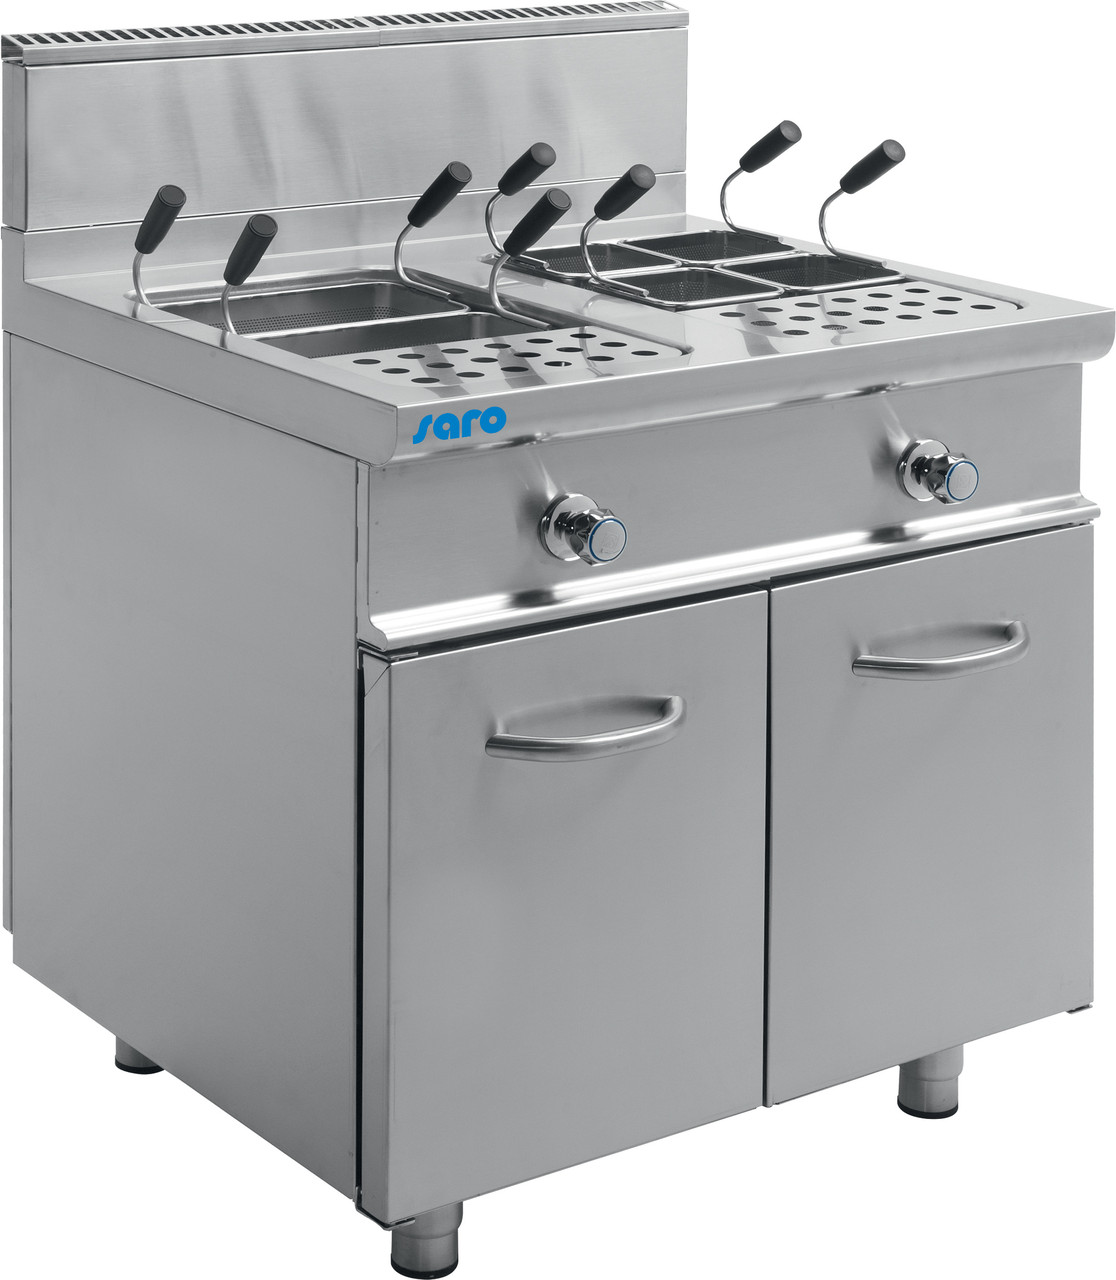 Газовая плита для макарон E7 / KPG2V80 Saro